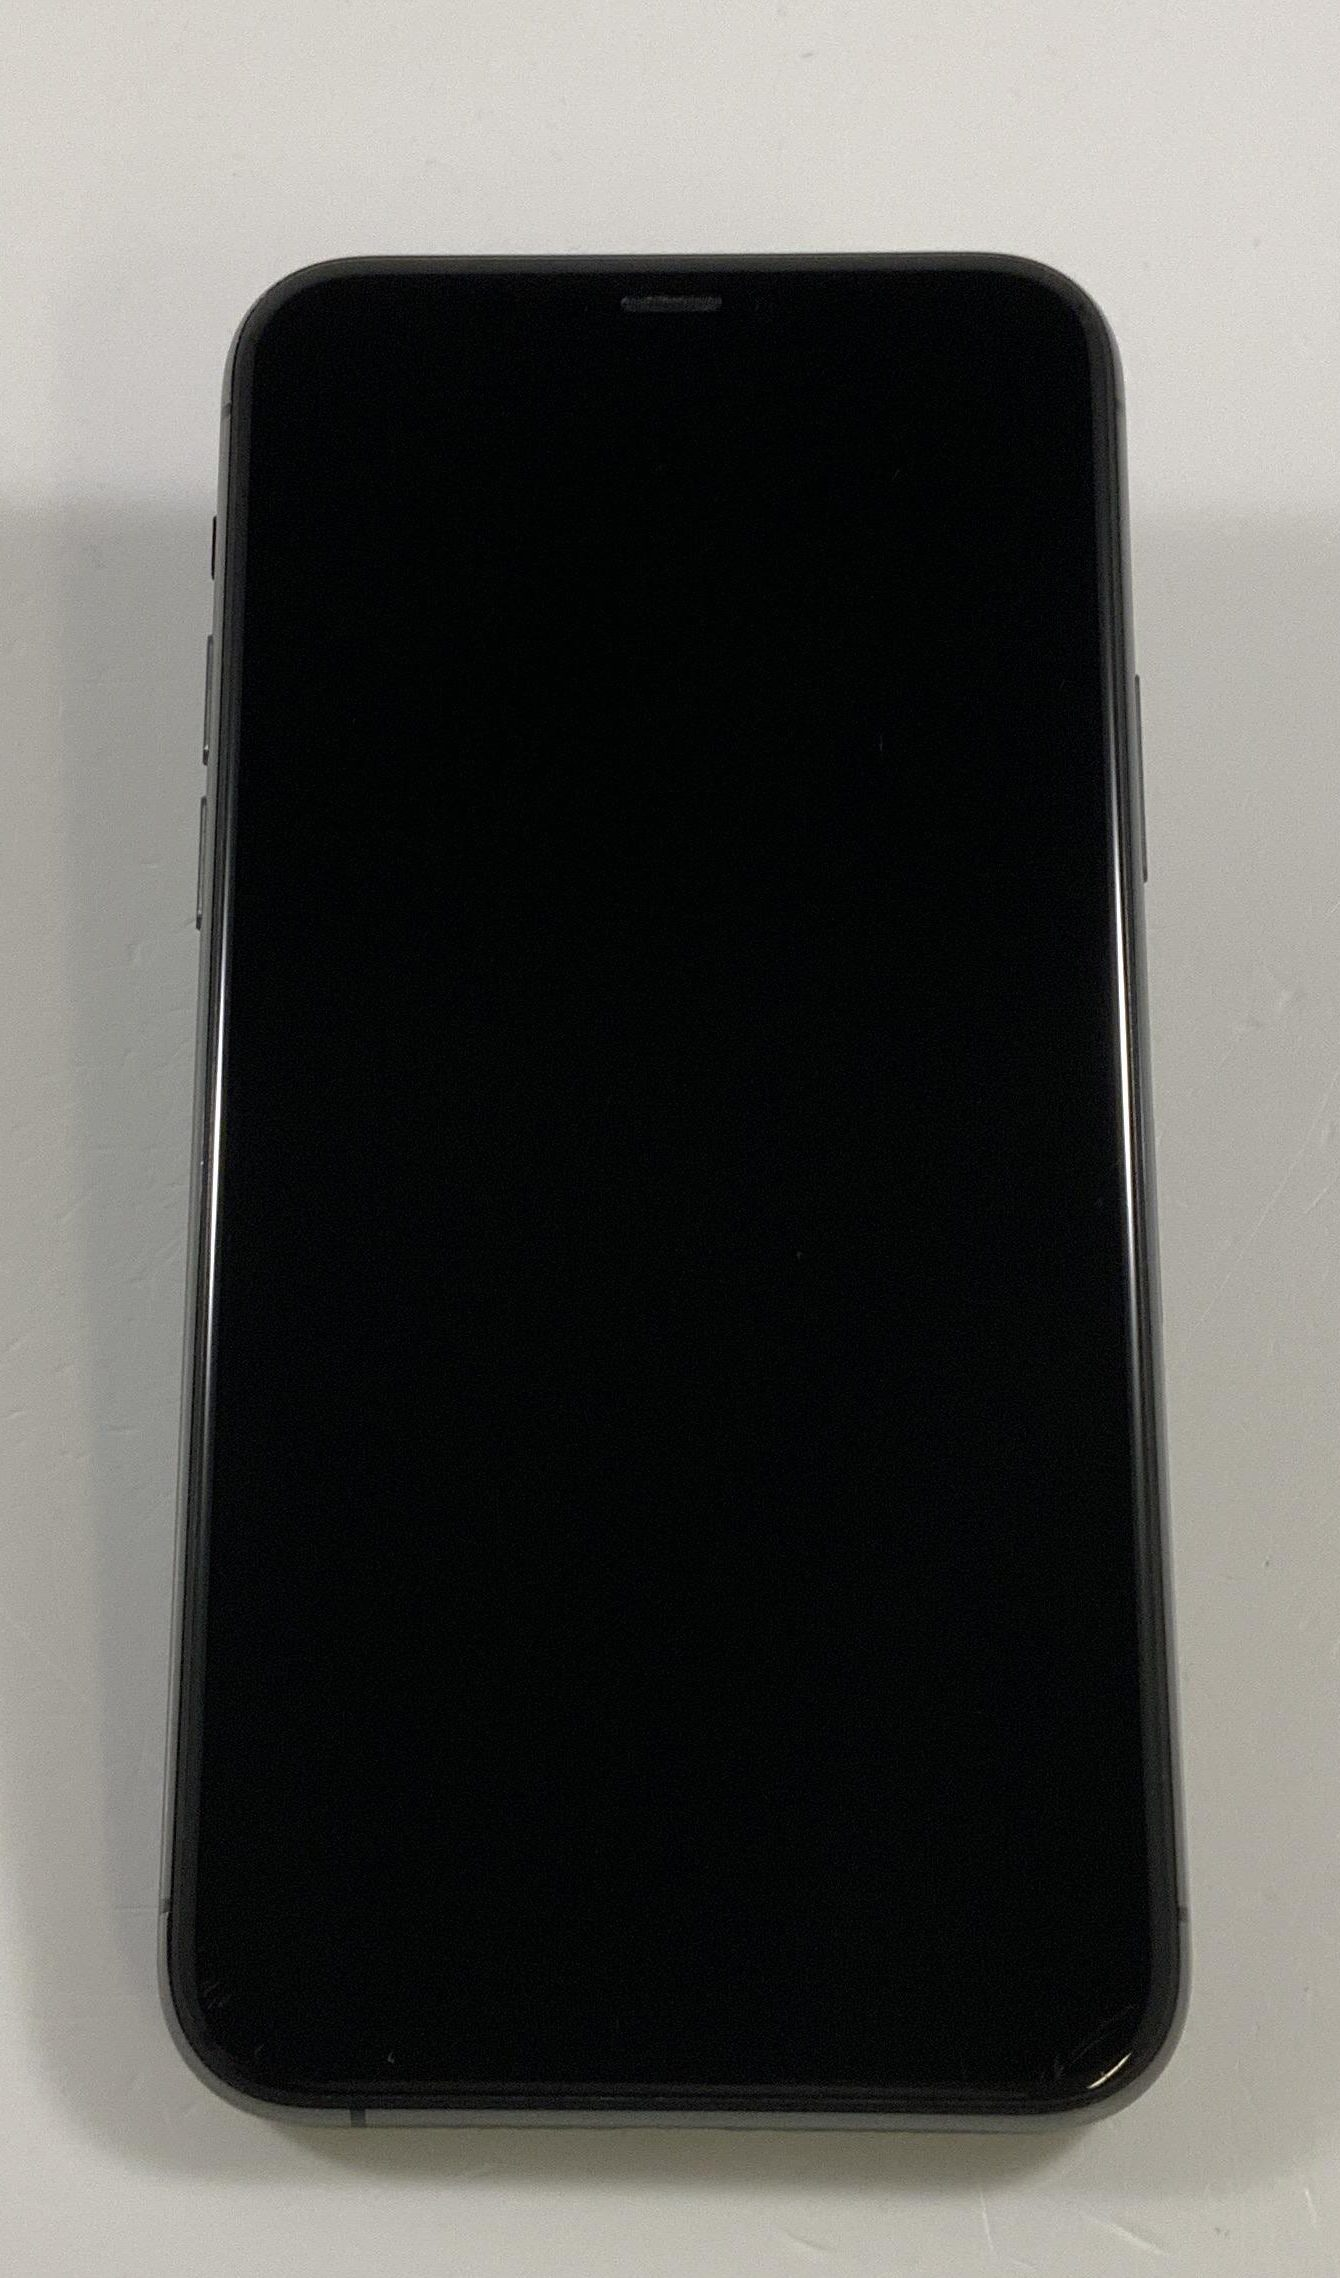 iPhone 11 Pro 64GB, 64GB, Space Gray, bild 1